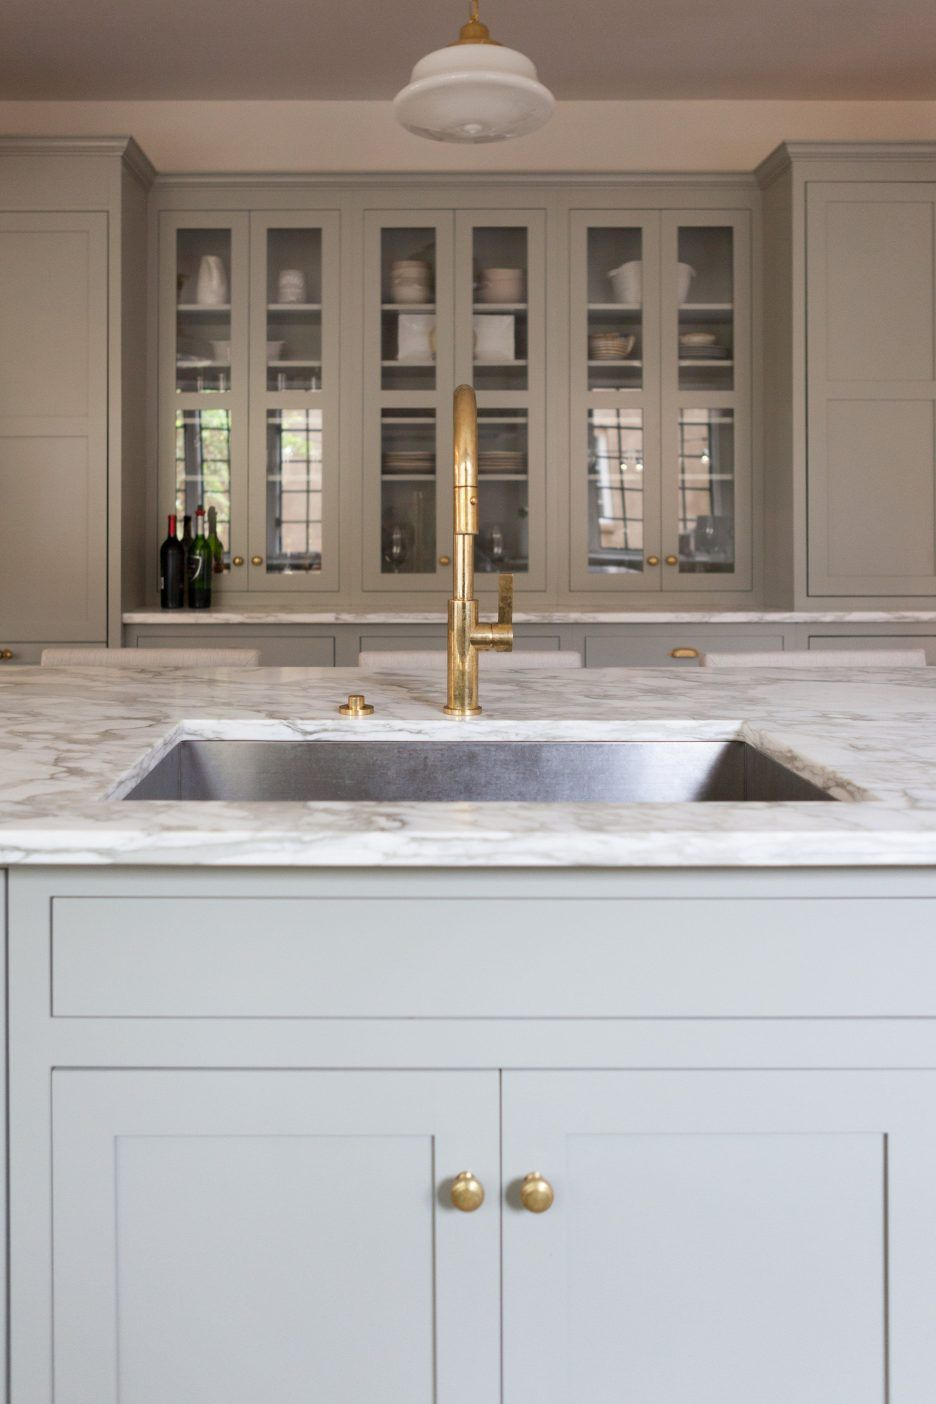 Chrome And Brass Bathroom Faucets Faucet Handle Bridge Faucet Brass Corner Bathroom Vanity Brass Kitc Brass Kitchen Faucet Brass Kitchen Tap Bathroom Sink Taps